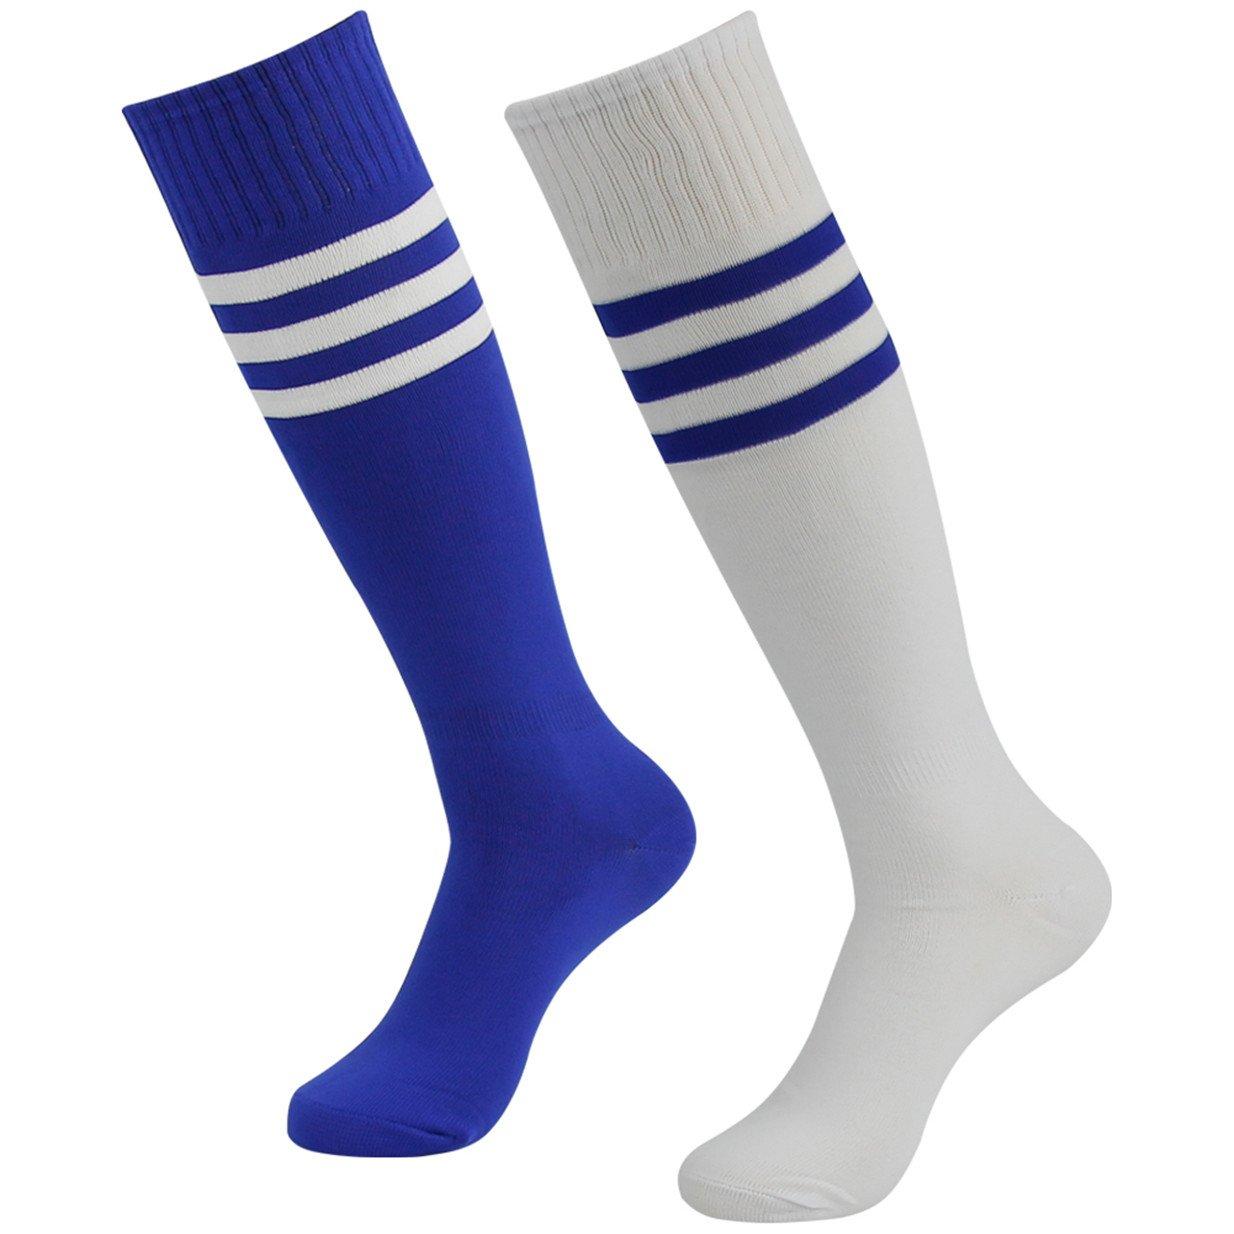 3street ユニセックス ニーハイ トリプルストライプ アスレチック サッカー チューブ ソックス 2 / 6 / 10組 B07CNFV7Y7 08#2-Pair White Blue with Stripe 08#2-Pair White Blue with Stripe